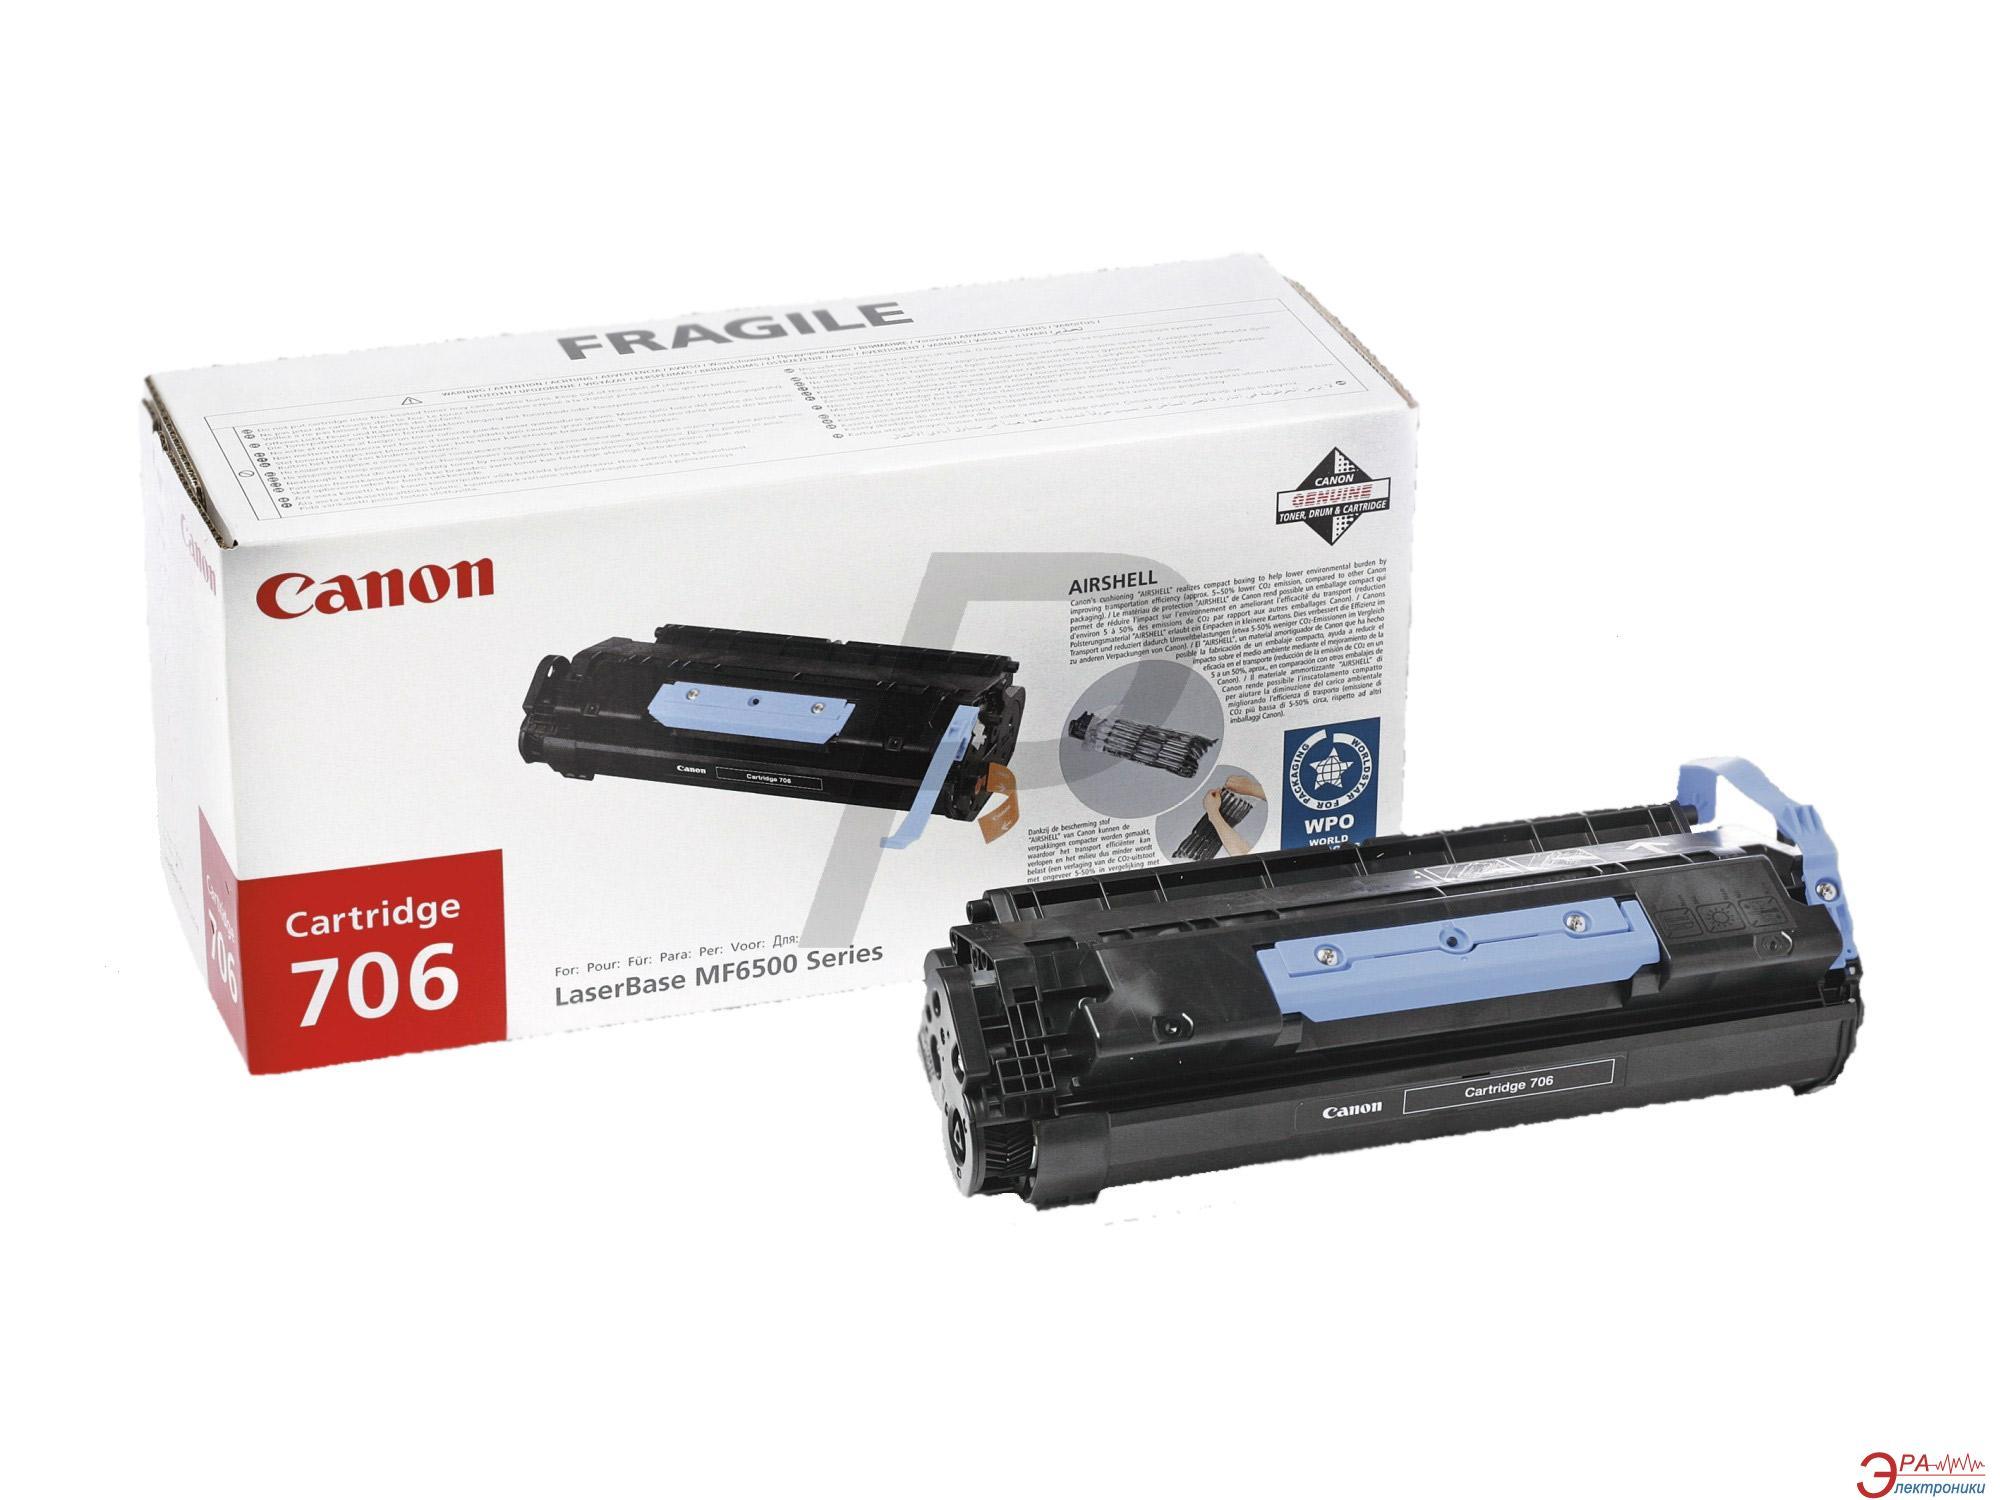 Картридж Canon 706 (0264B002) (LaserBase MFMF6530/MF6540PL/6550/MF6560PL/MF6580PL) Black